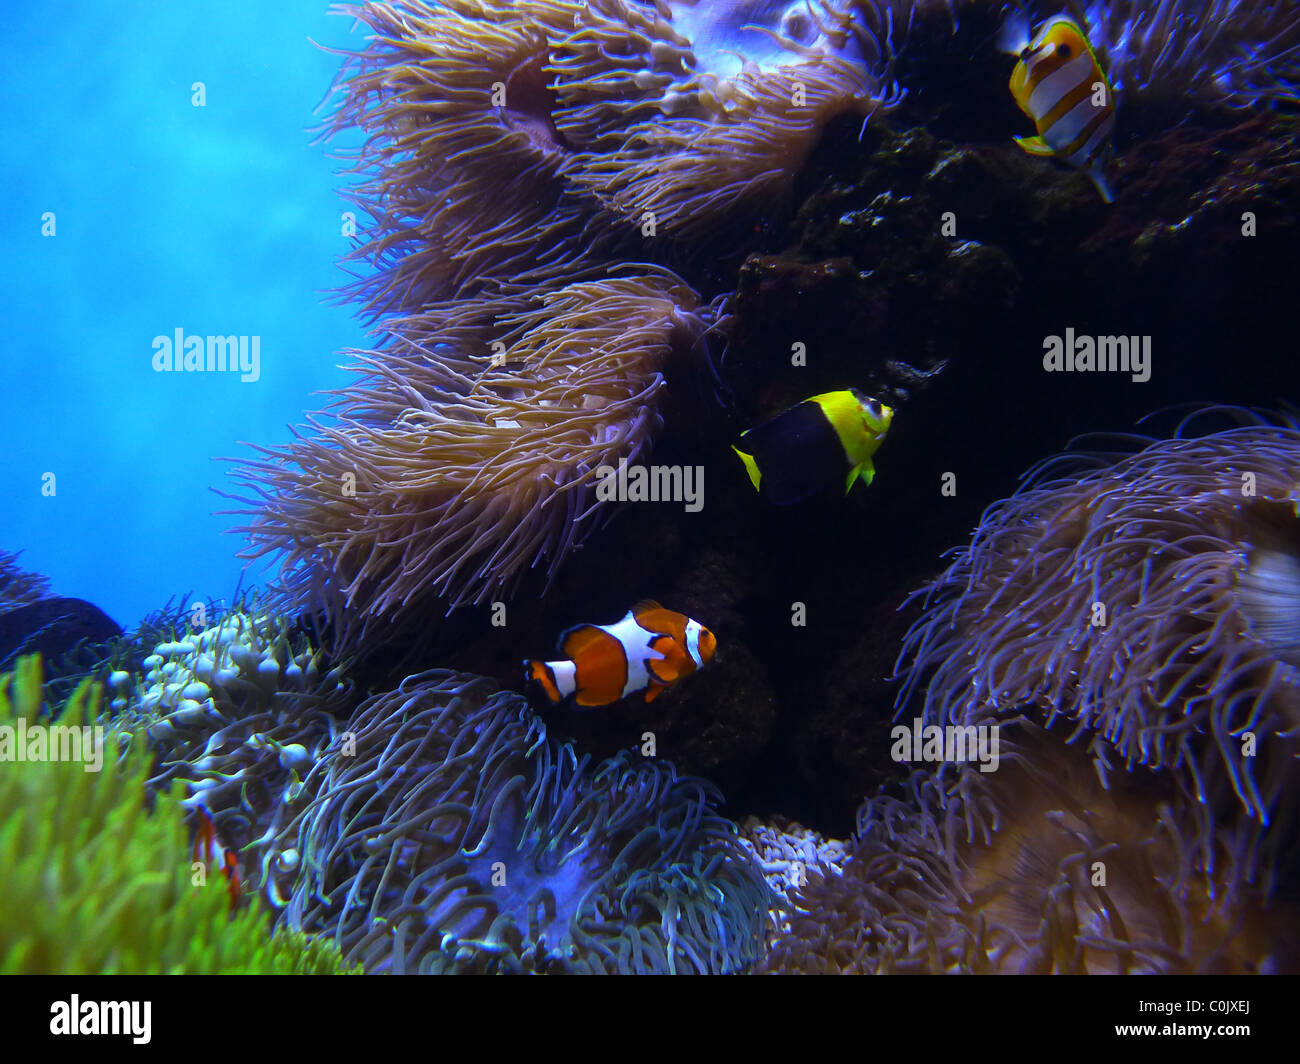 Waikiki Aquarium, Honolulu, Oahu, Hawaii - Stock Image